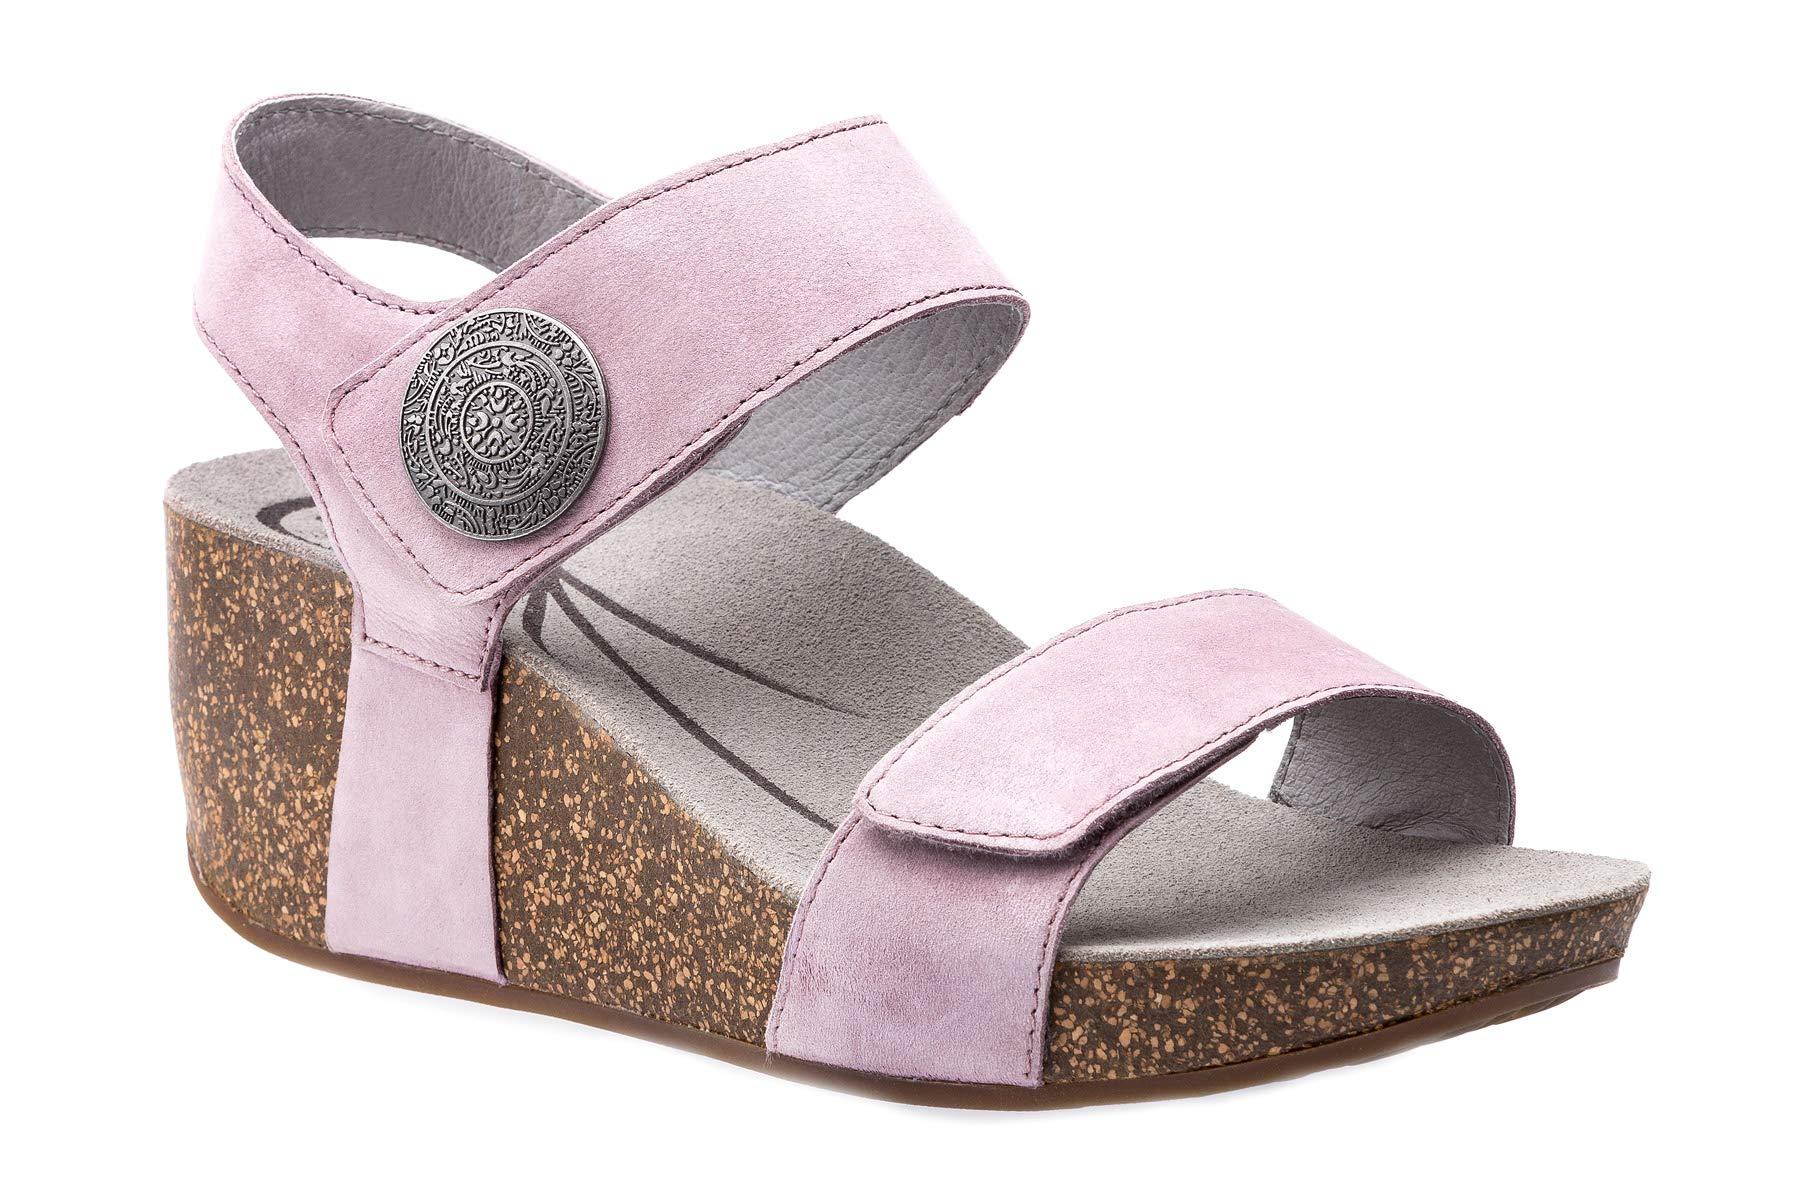 ABEO UNA Metatarsal - Women's Wedge Sandals